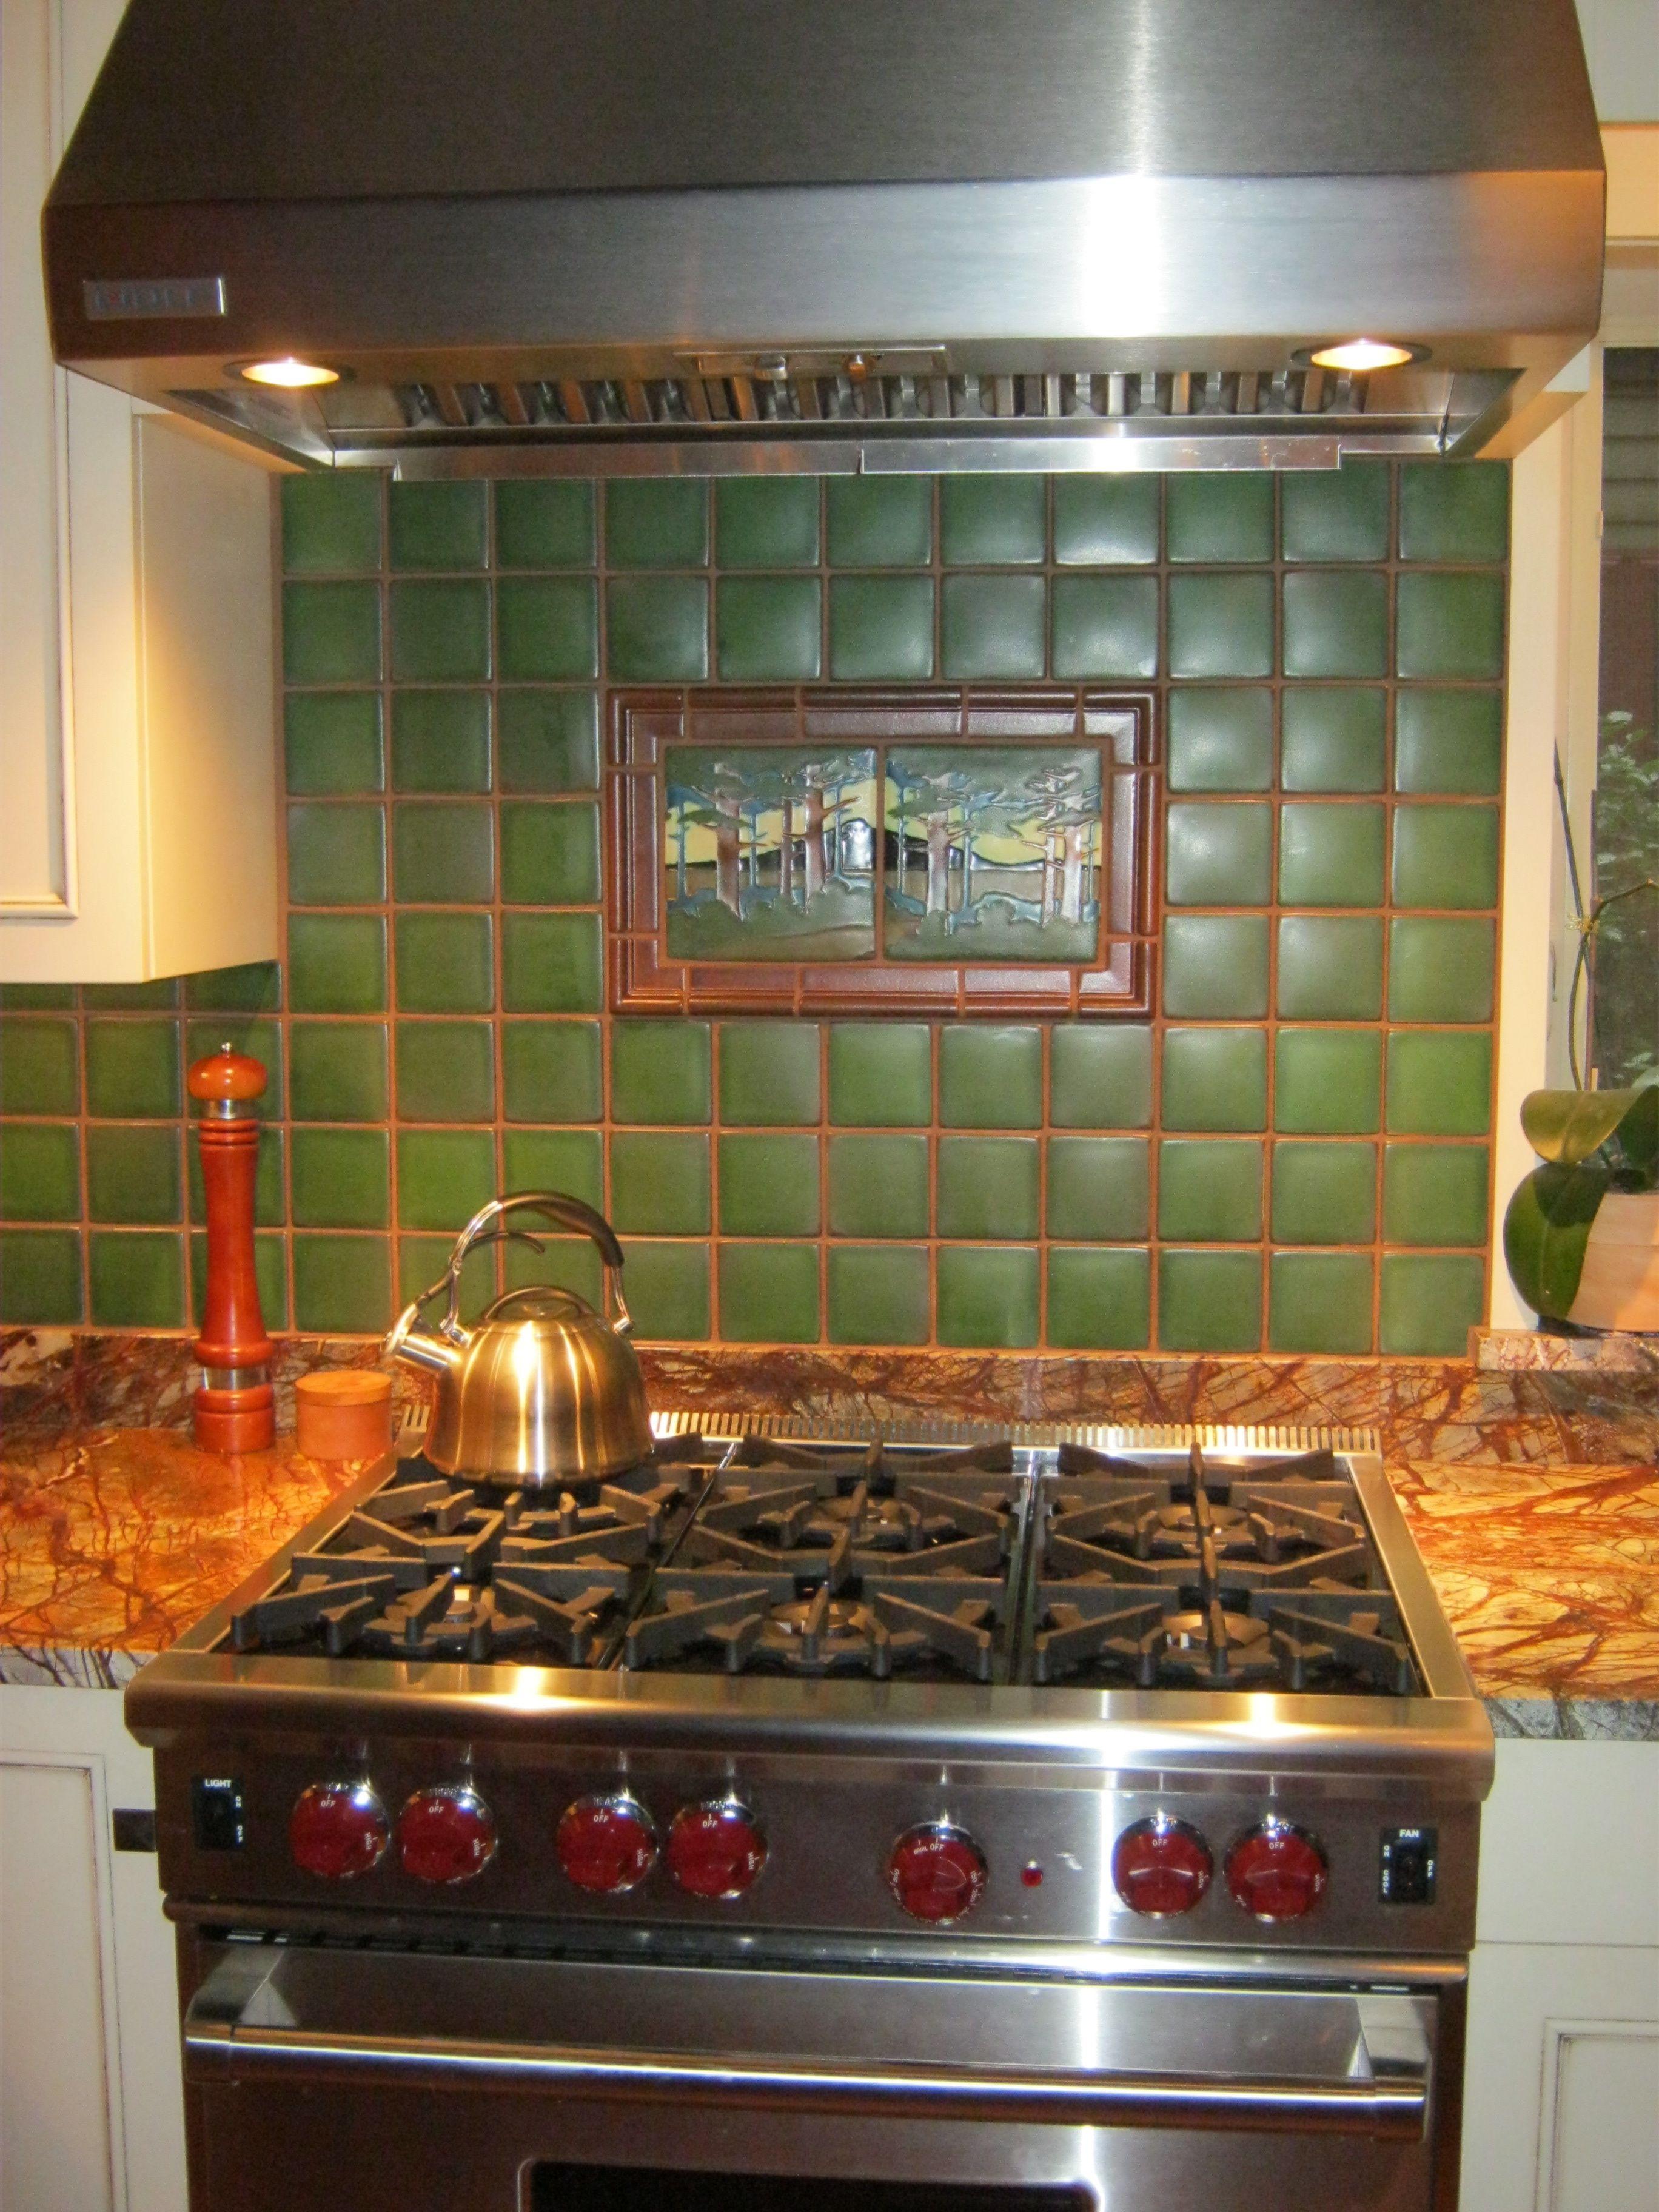 motawi backsplash tile at ceramiche tile and stone kitchen remodel layout eclectic kitchen on kitchen interior tiles id=46177